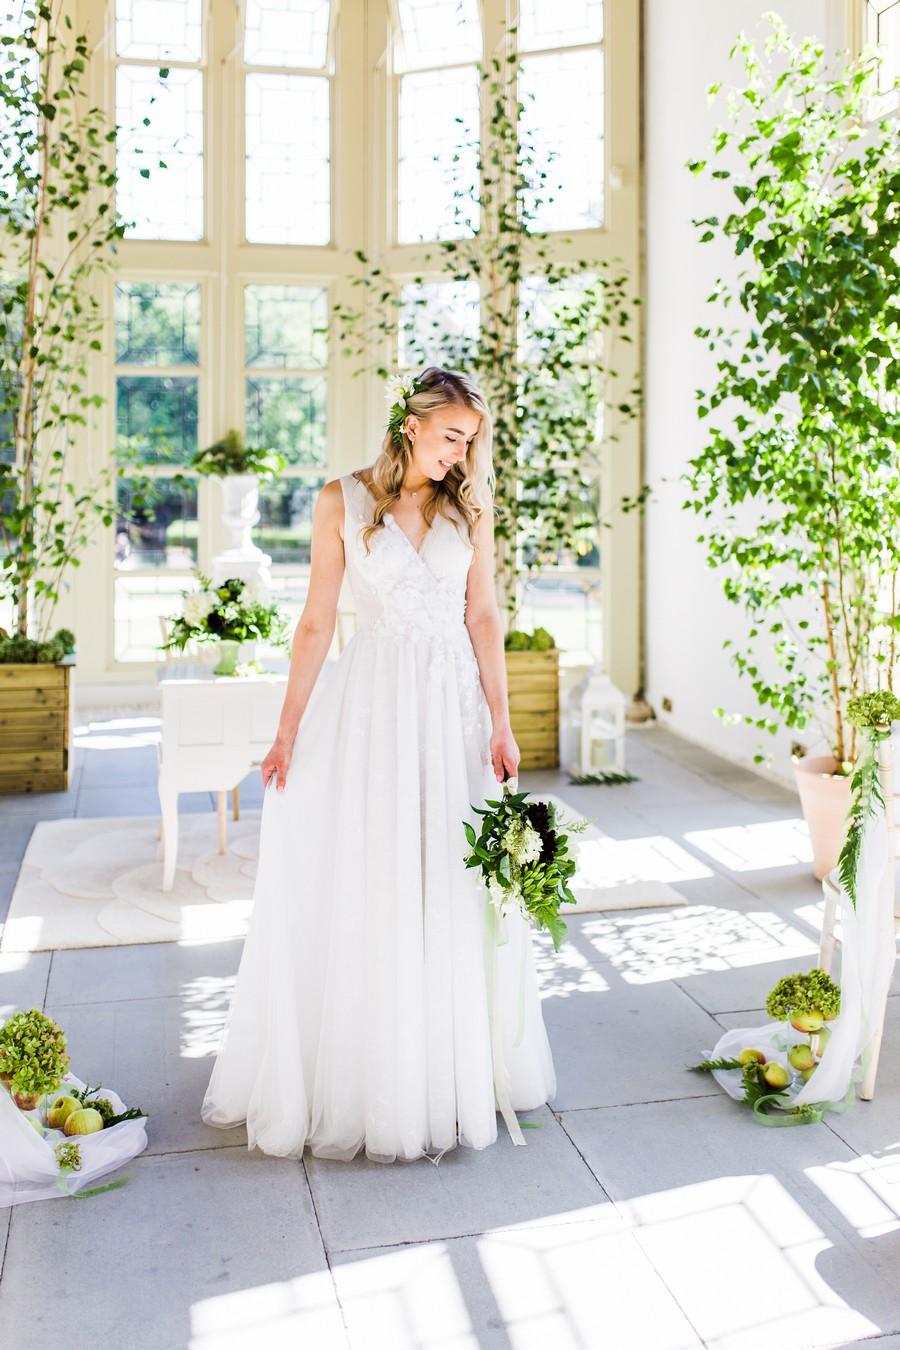 Highcliffe Castle wedding inspiration on the English Wedding Blog (16)